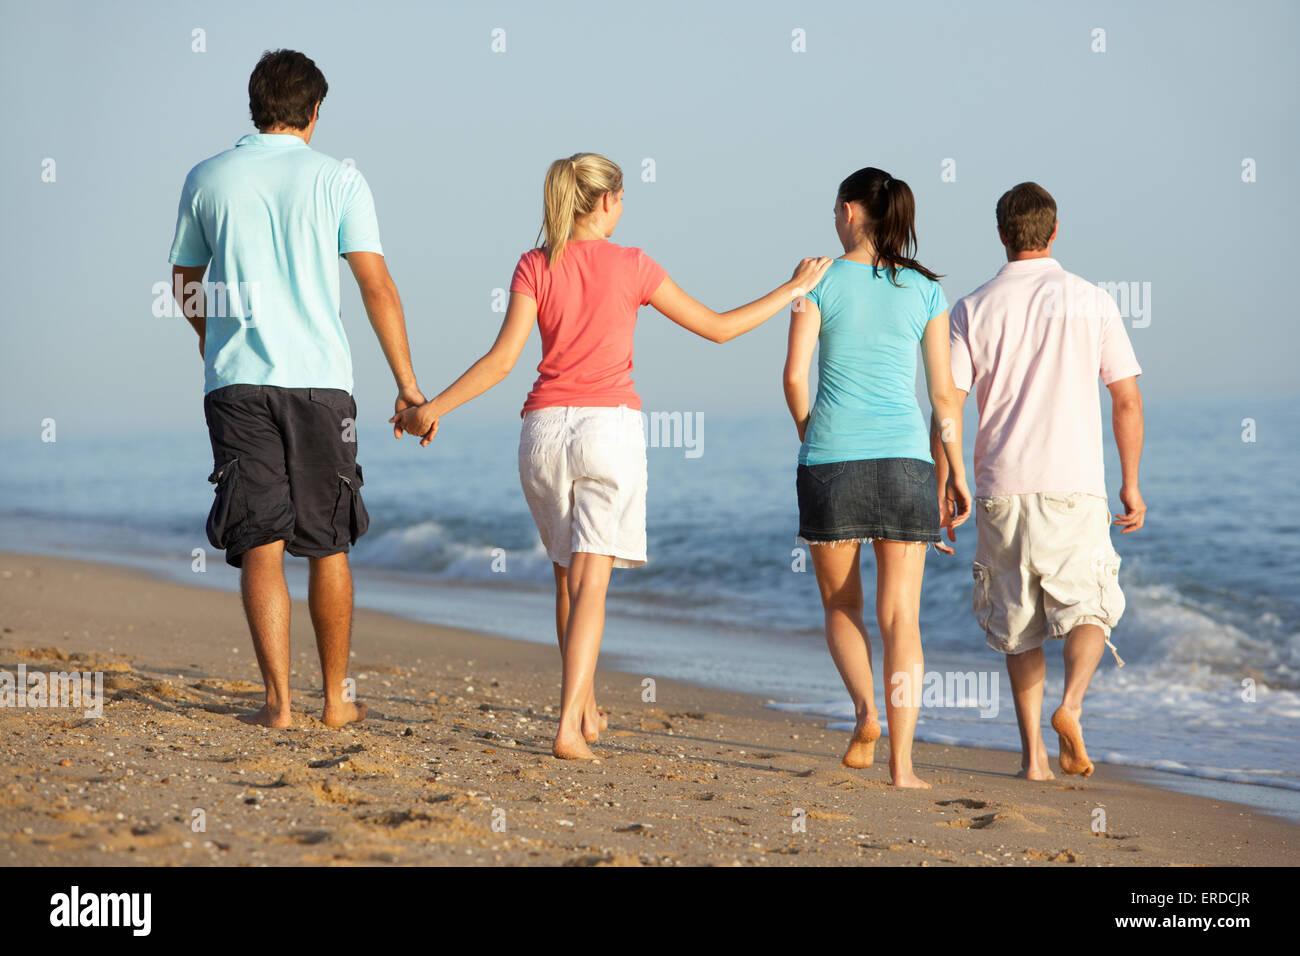 woman,walk,walking,beach,Lifestyle,Caucasian,Female,twenties,20s,outdoors,beach,enjoying,relaxed,relaxing,holiday,vacation,full - Stock Image